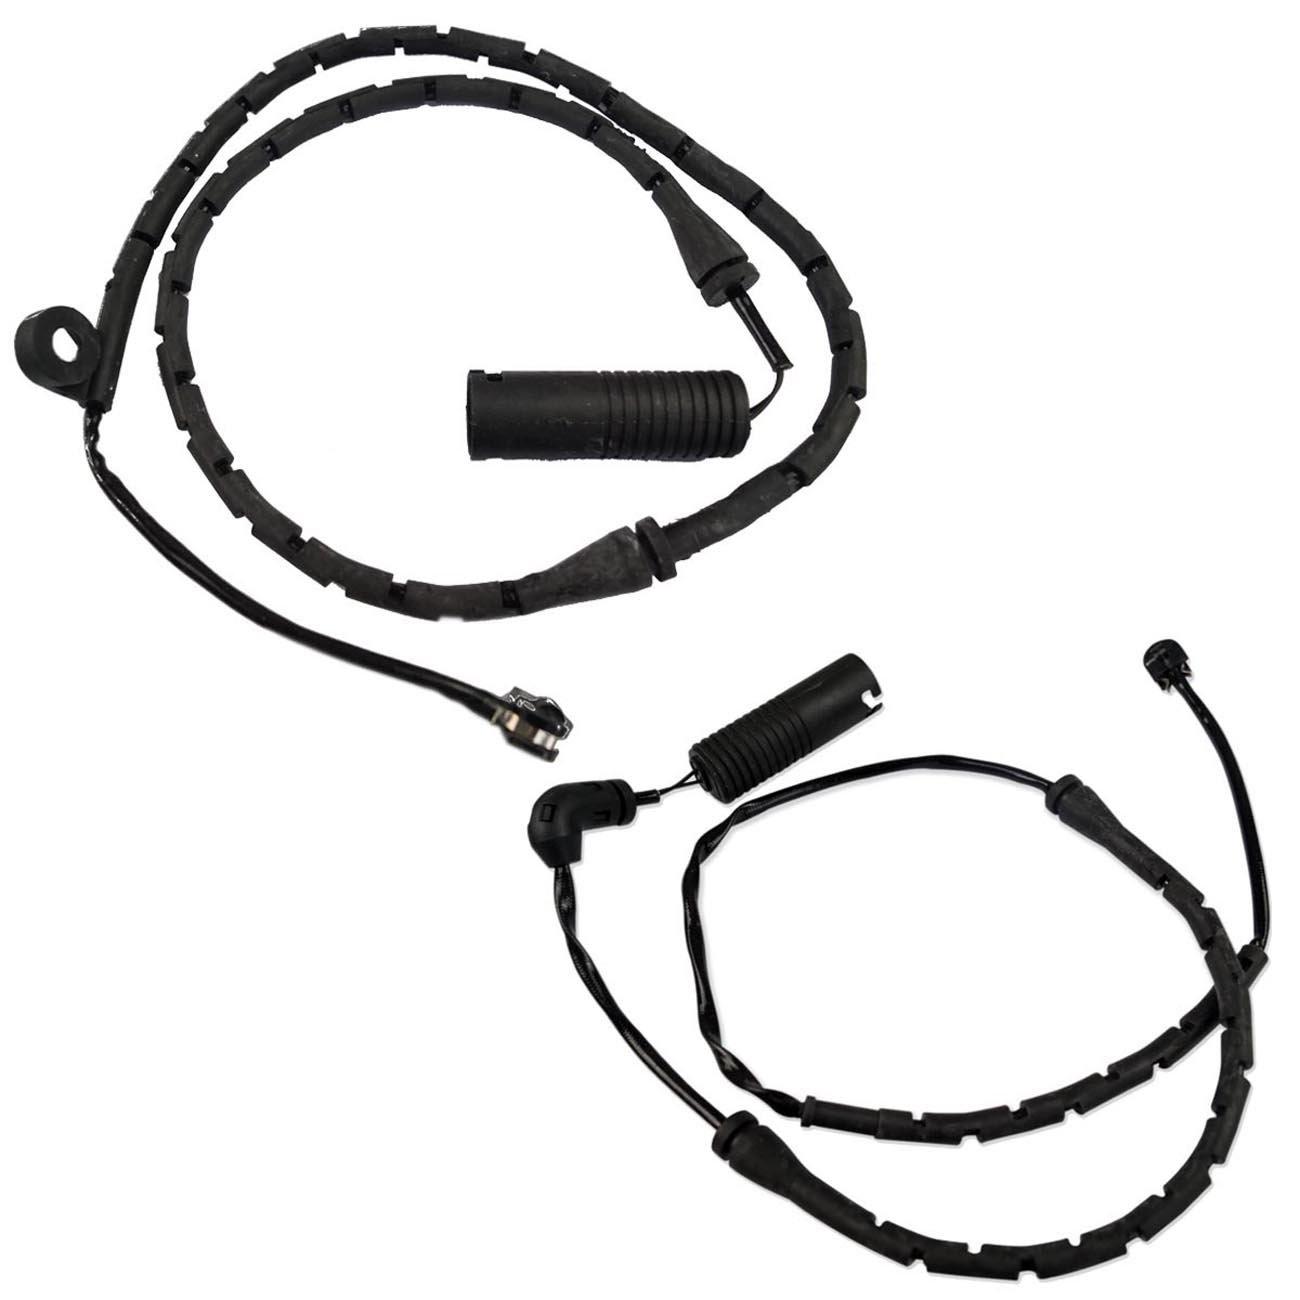 Bapmic 34351165579 Front Brake Pad Wear Sensor for BMW X5 E53 3.0i 4.4i 4.6is 4.8is 2000-2006